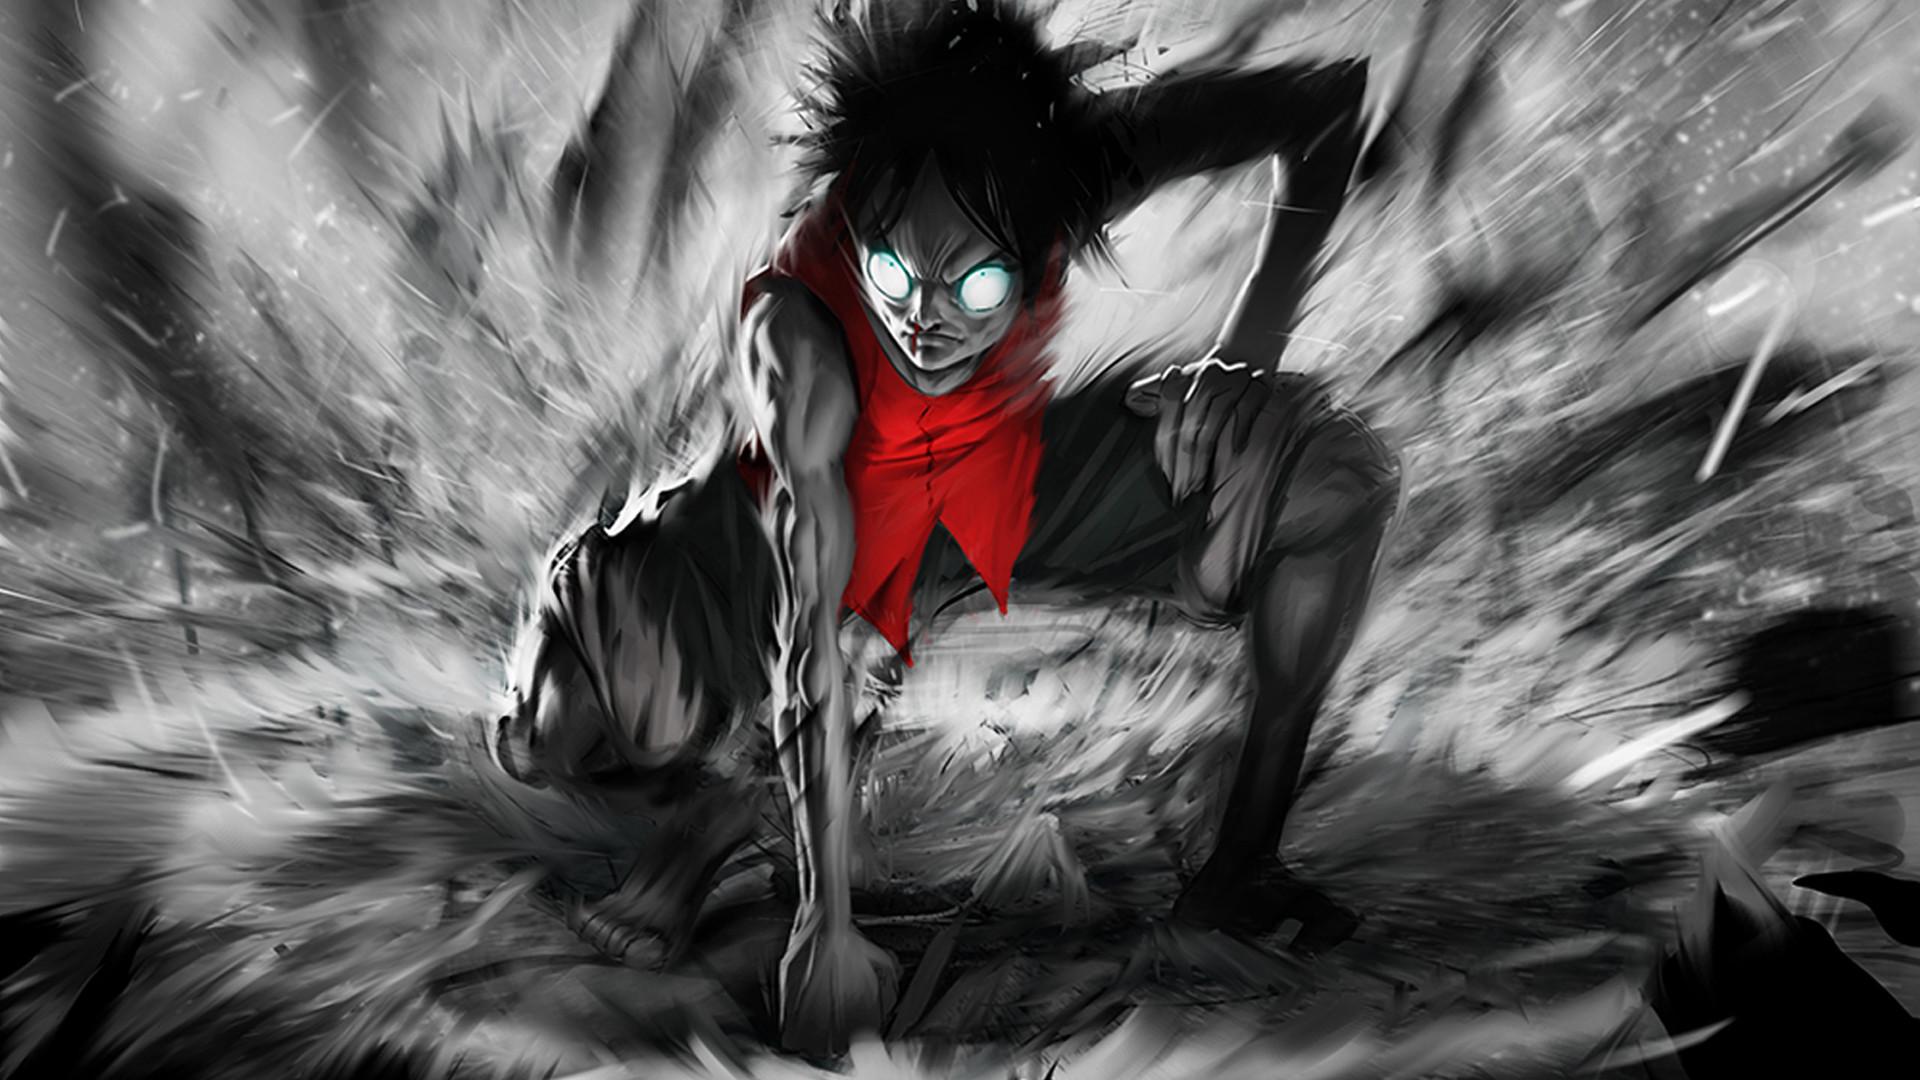 anime hd desktop backgrounds cool anime hd wallpapers anime wallpaper